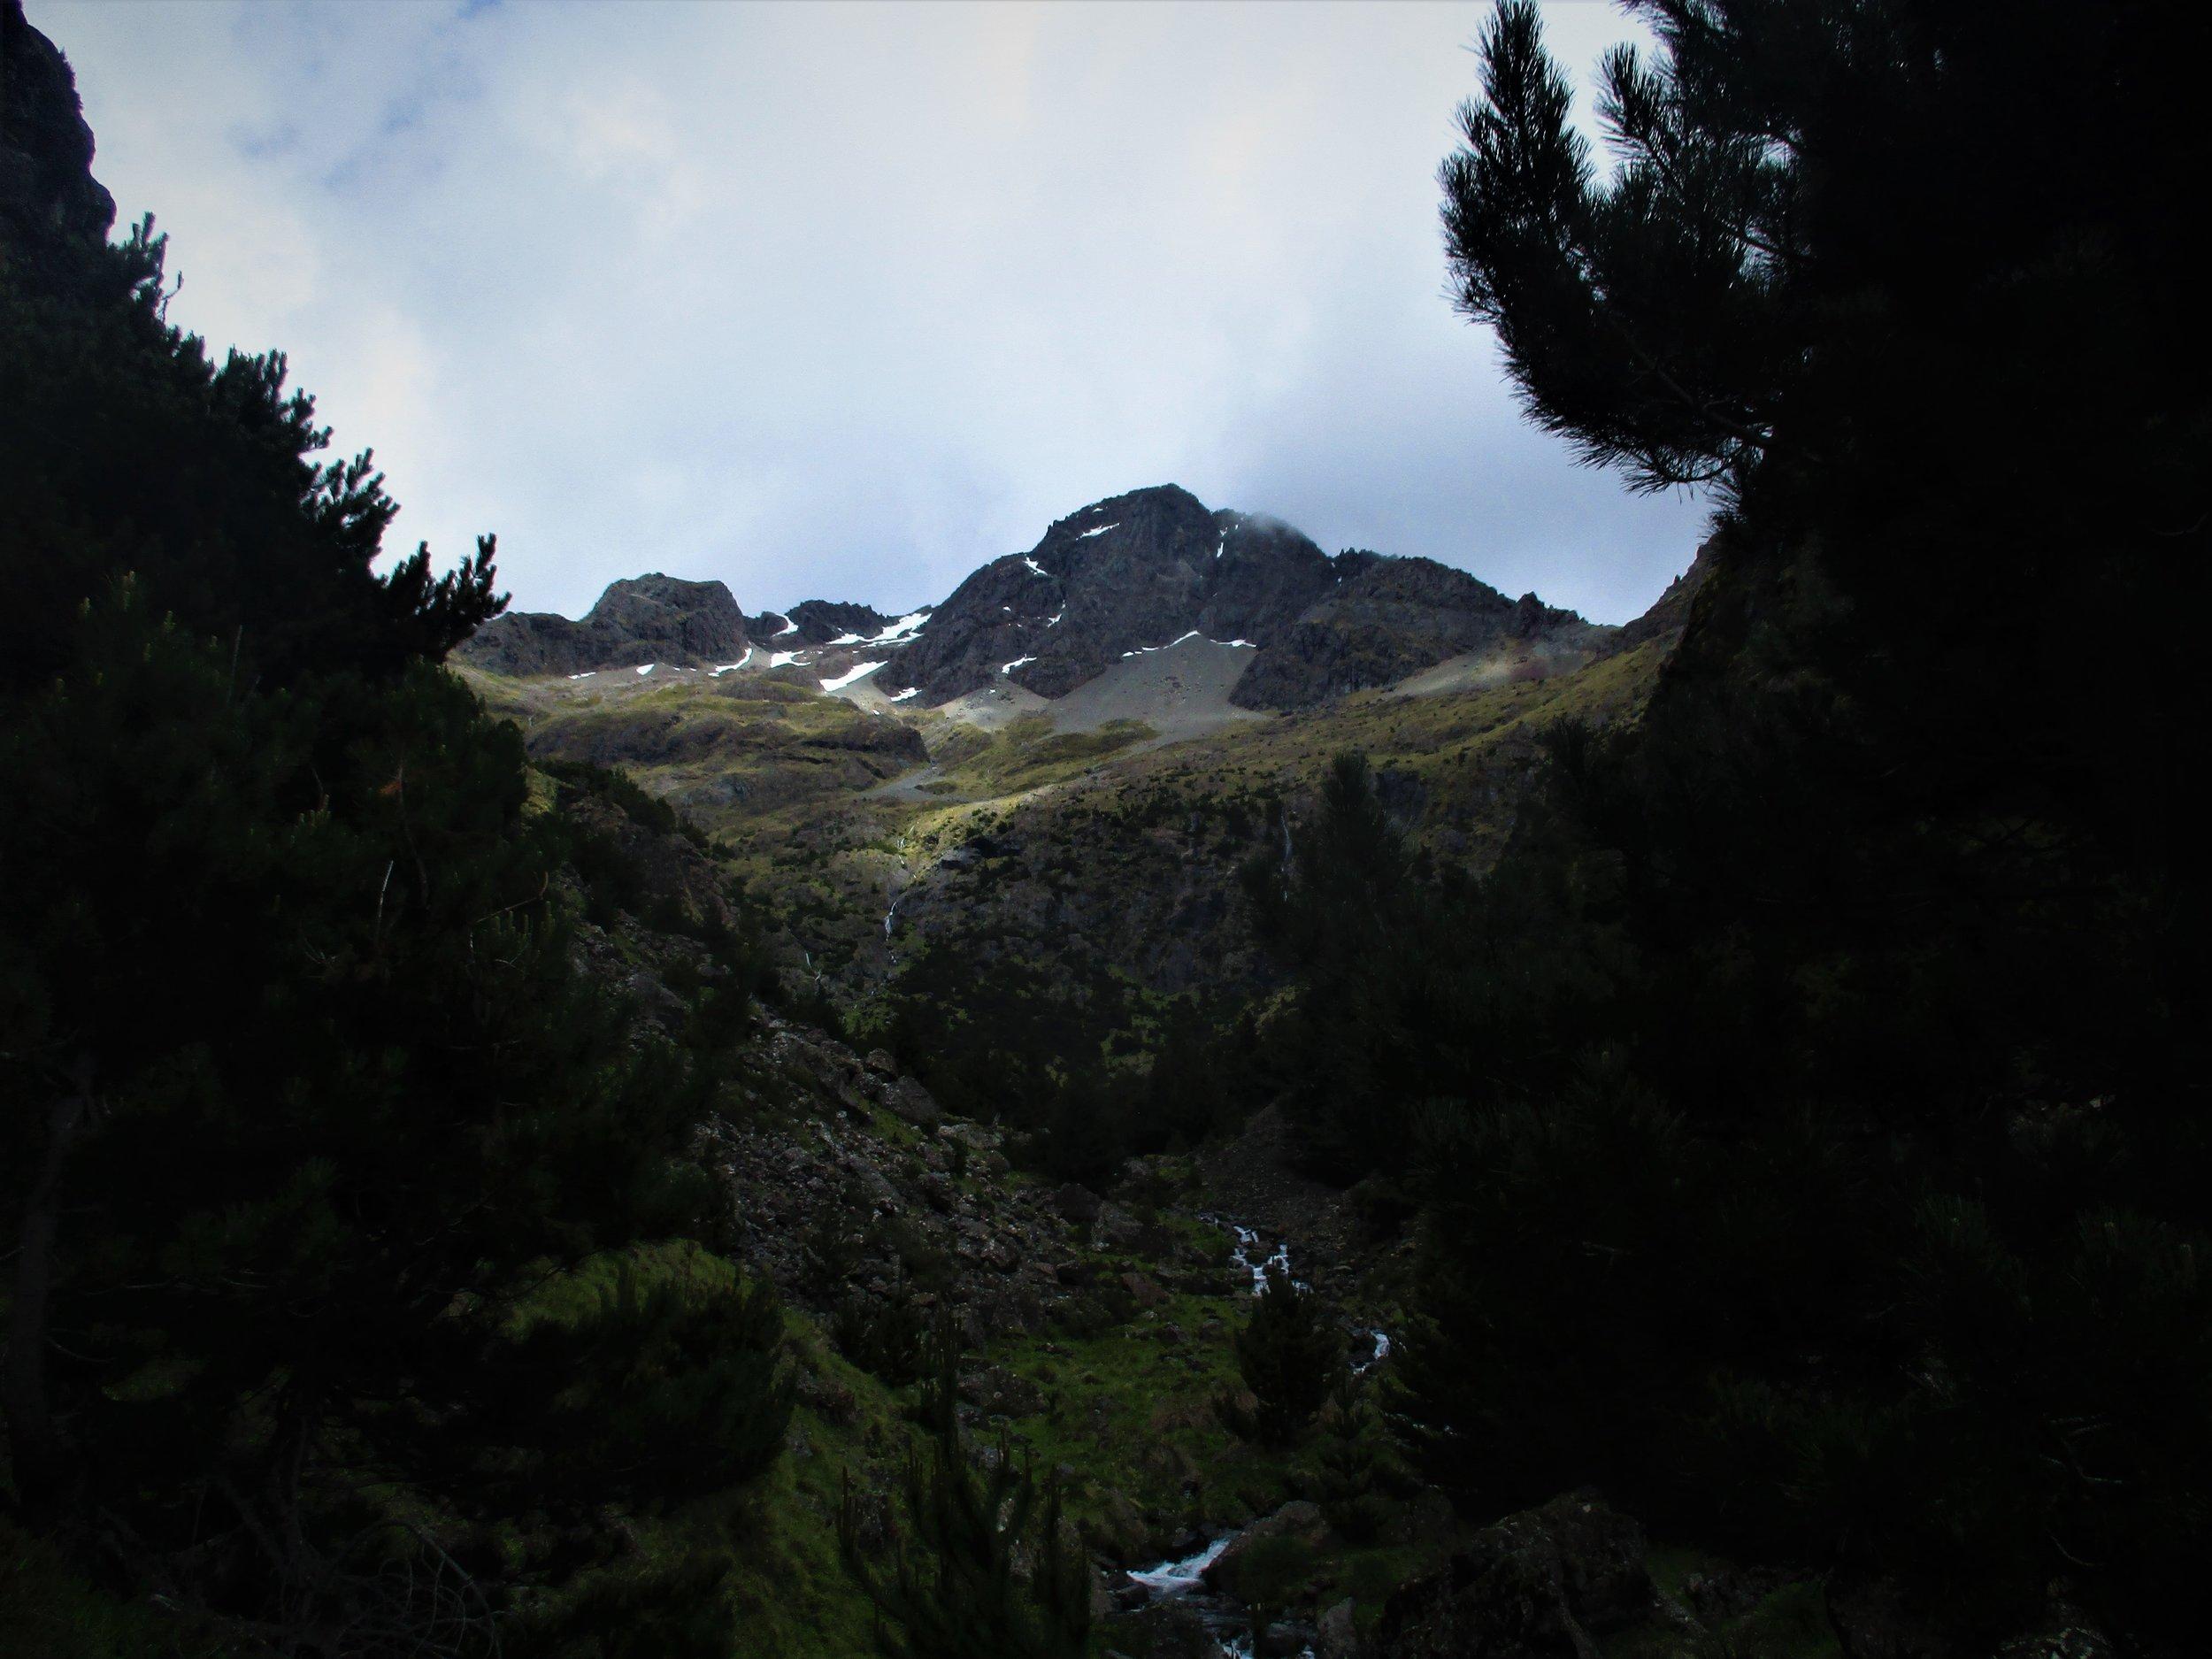 Lower slopes of Scotts Knob